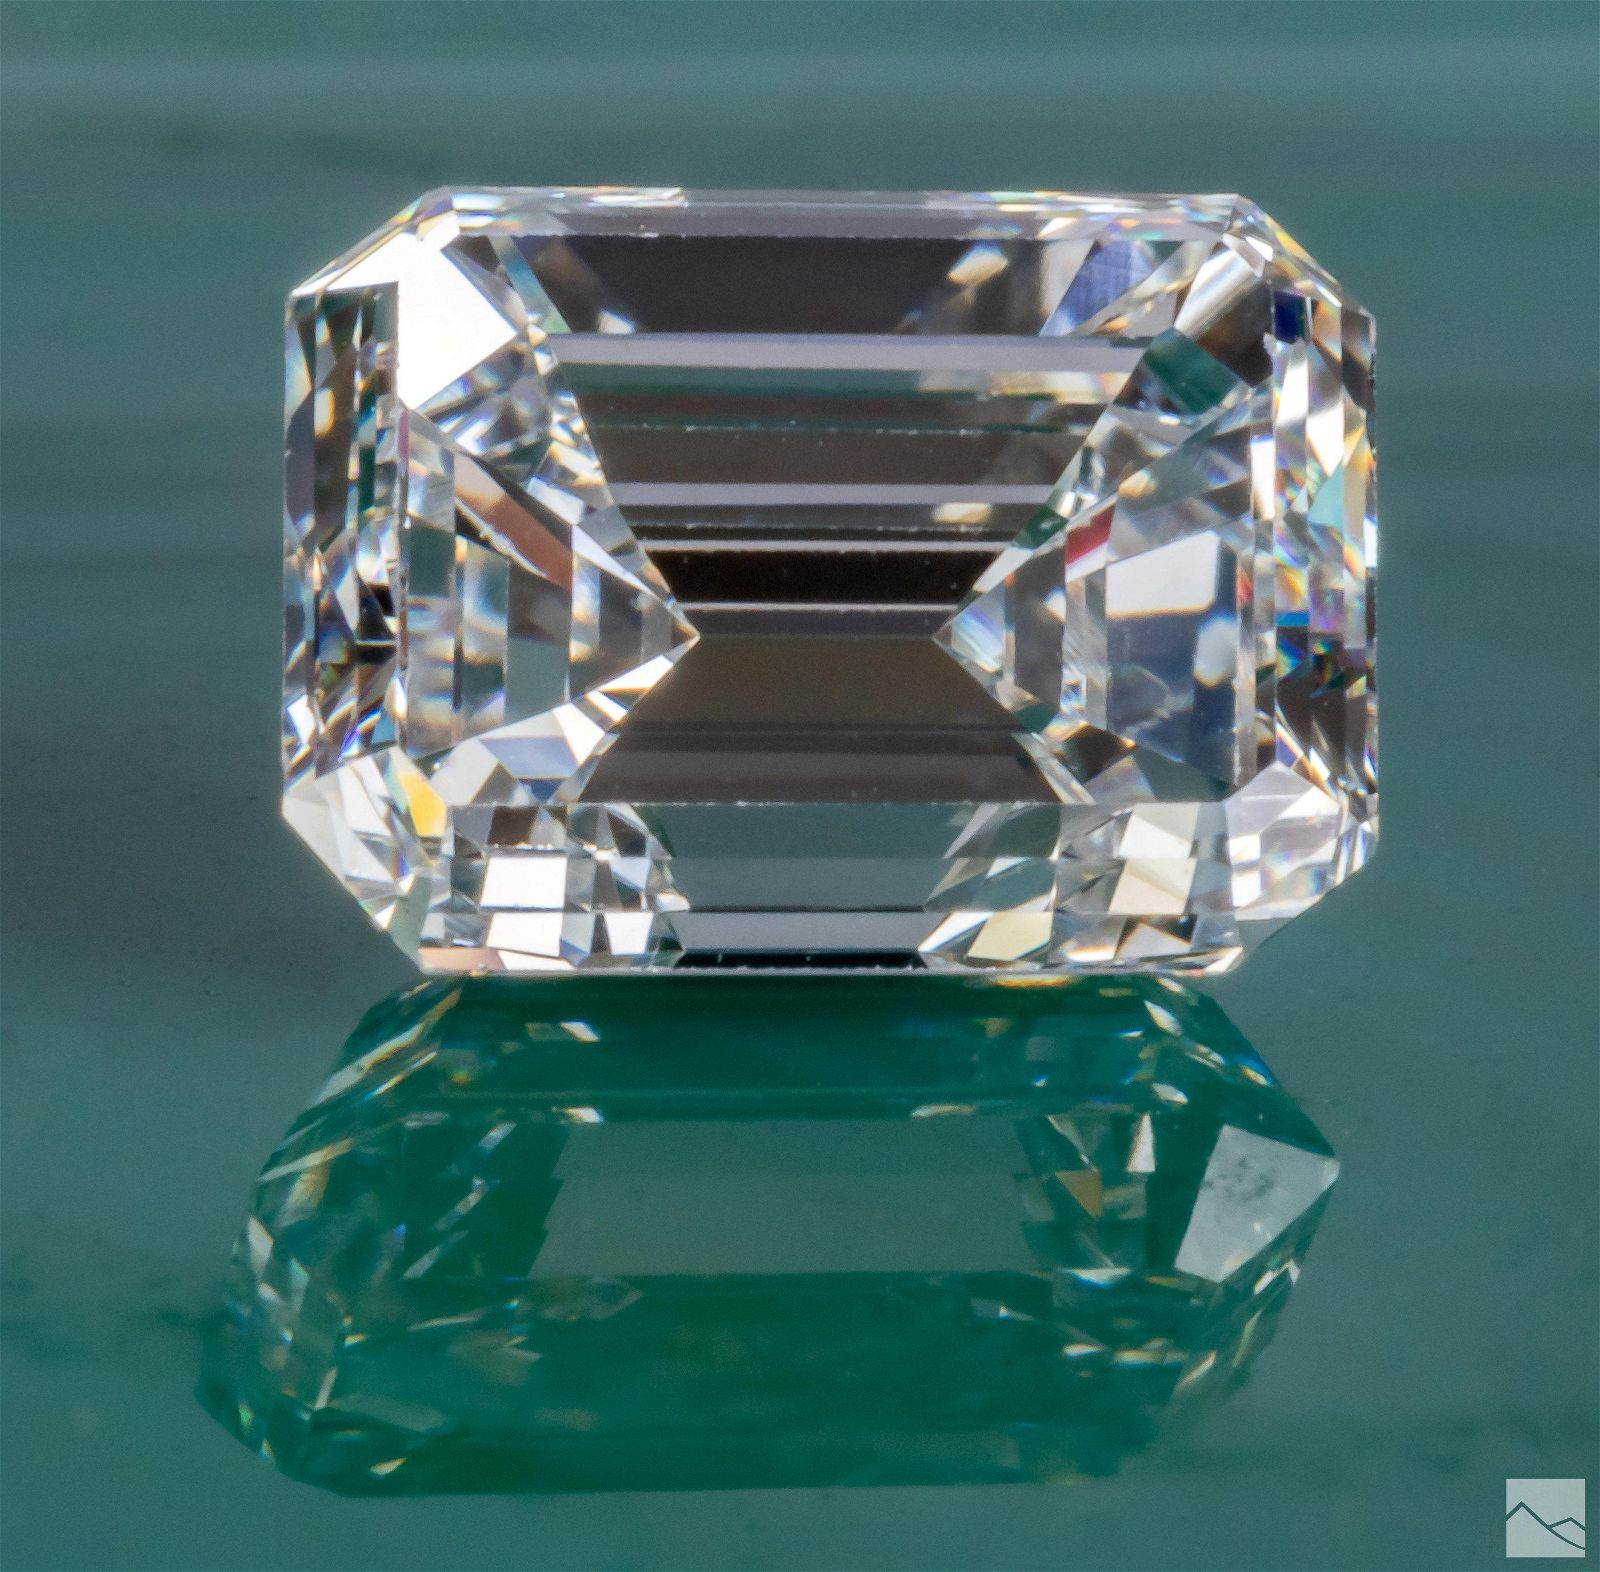 GIA Cert. 1.81 D VS1 Emerald Cut Natural Diamond